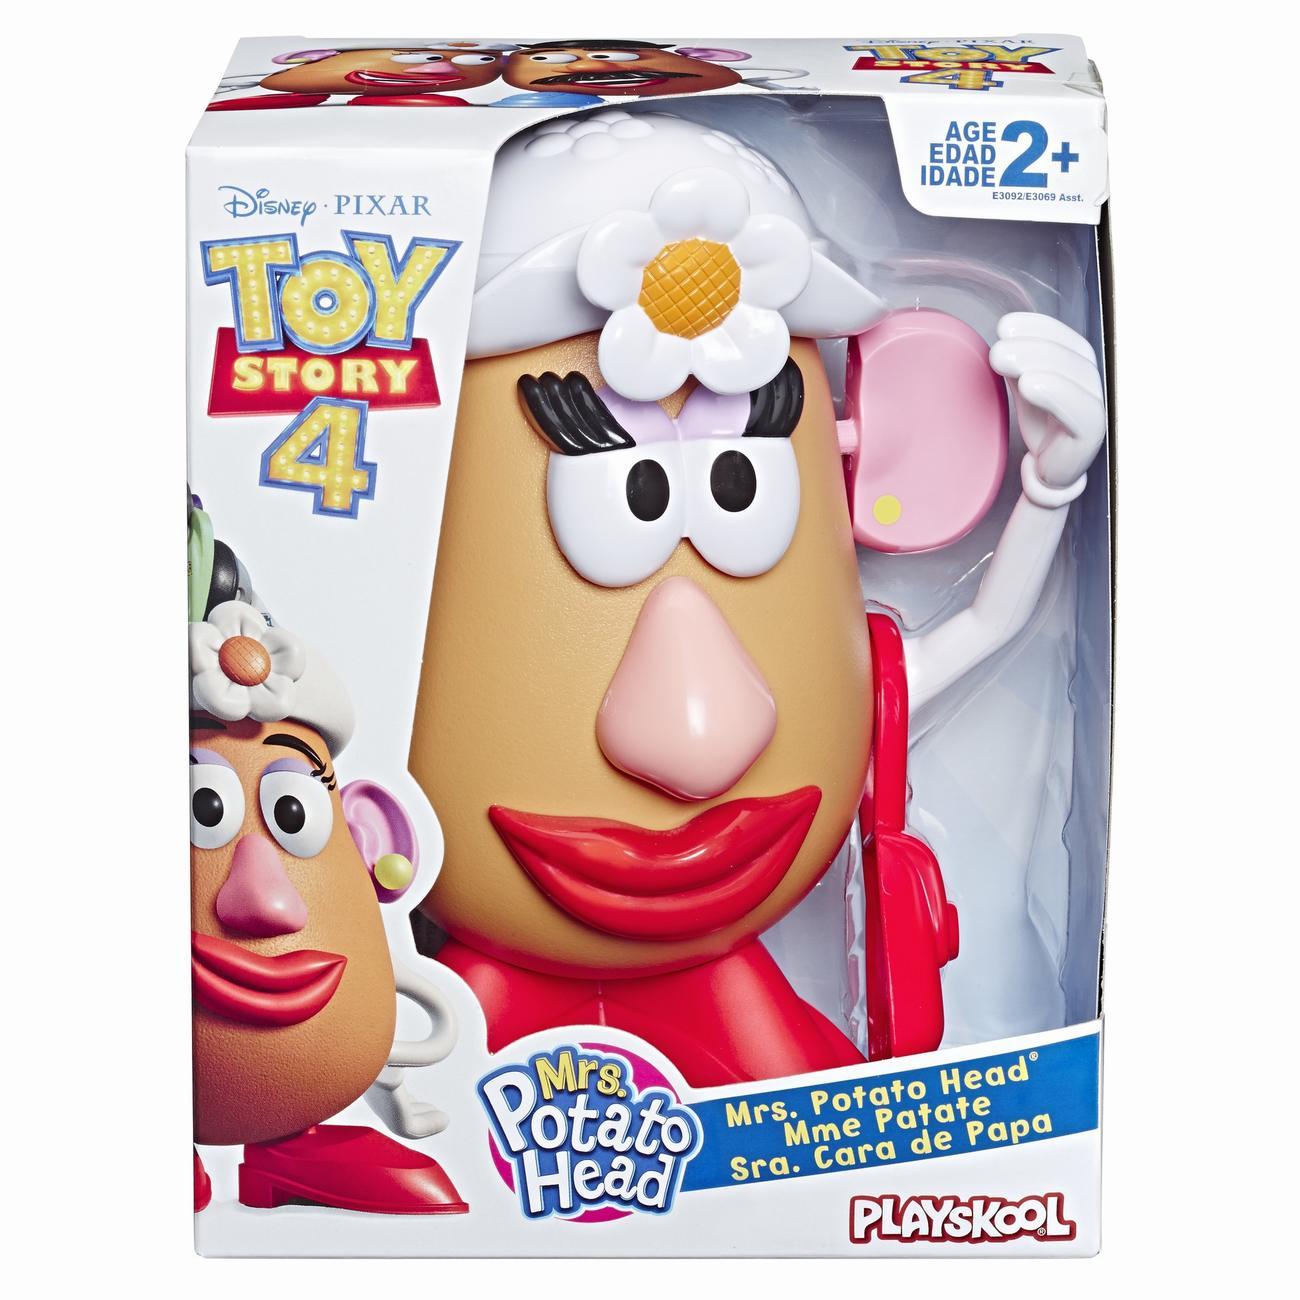 Sra Cara De Papa Toy Story 4 Señora